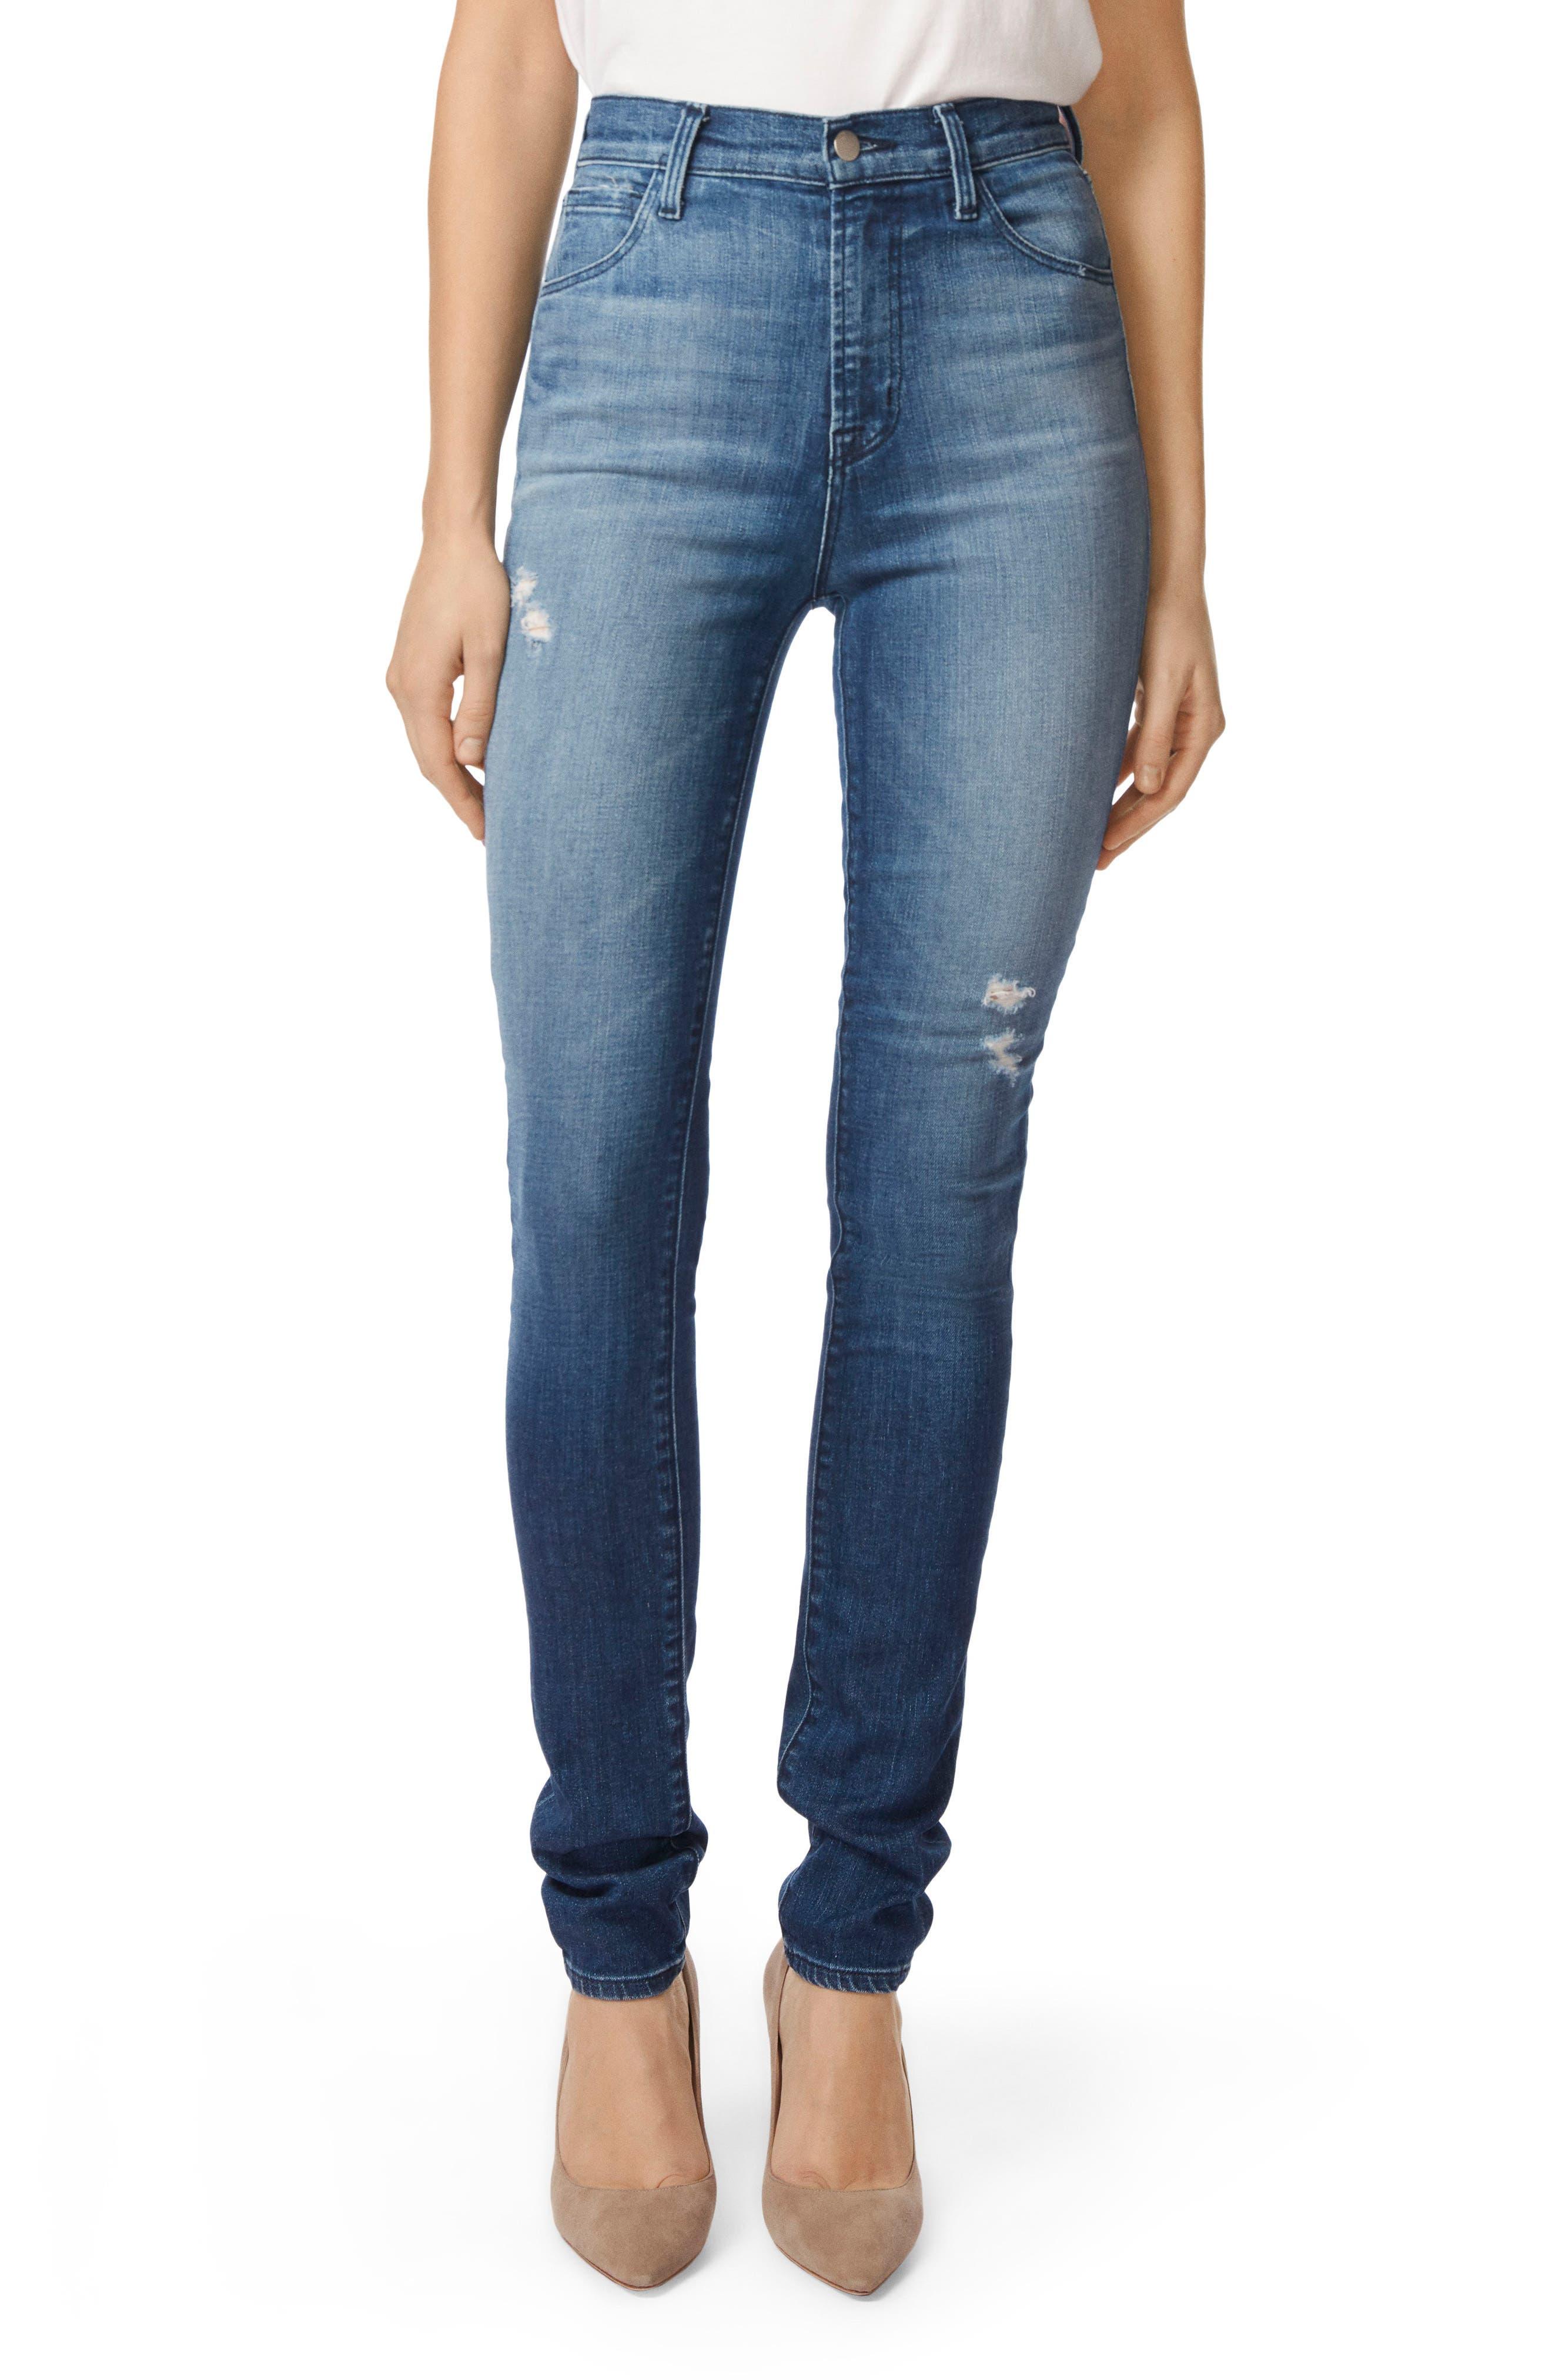 Carolina Super High Waist Skinny Jeans,                             Main thumbnail 1, color,                             Mystic